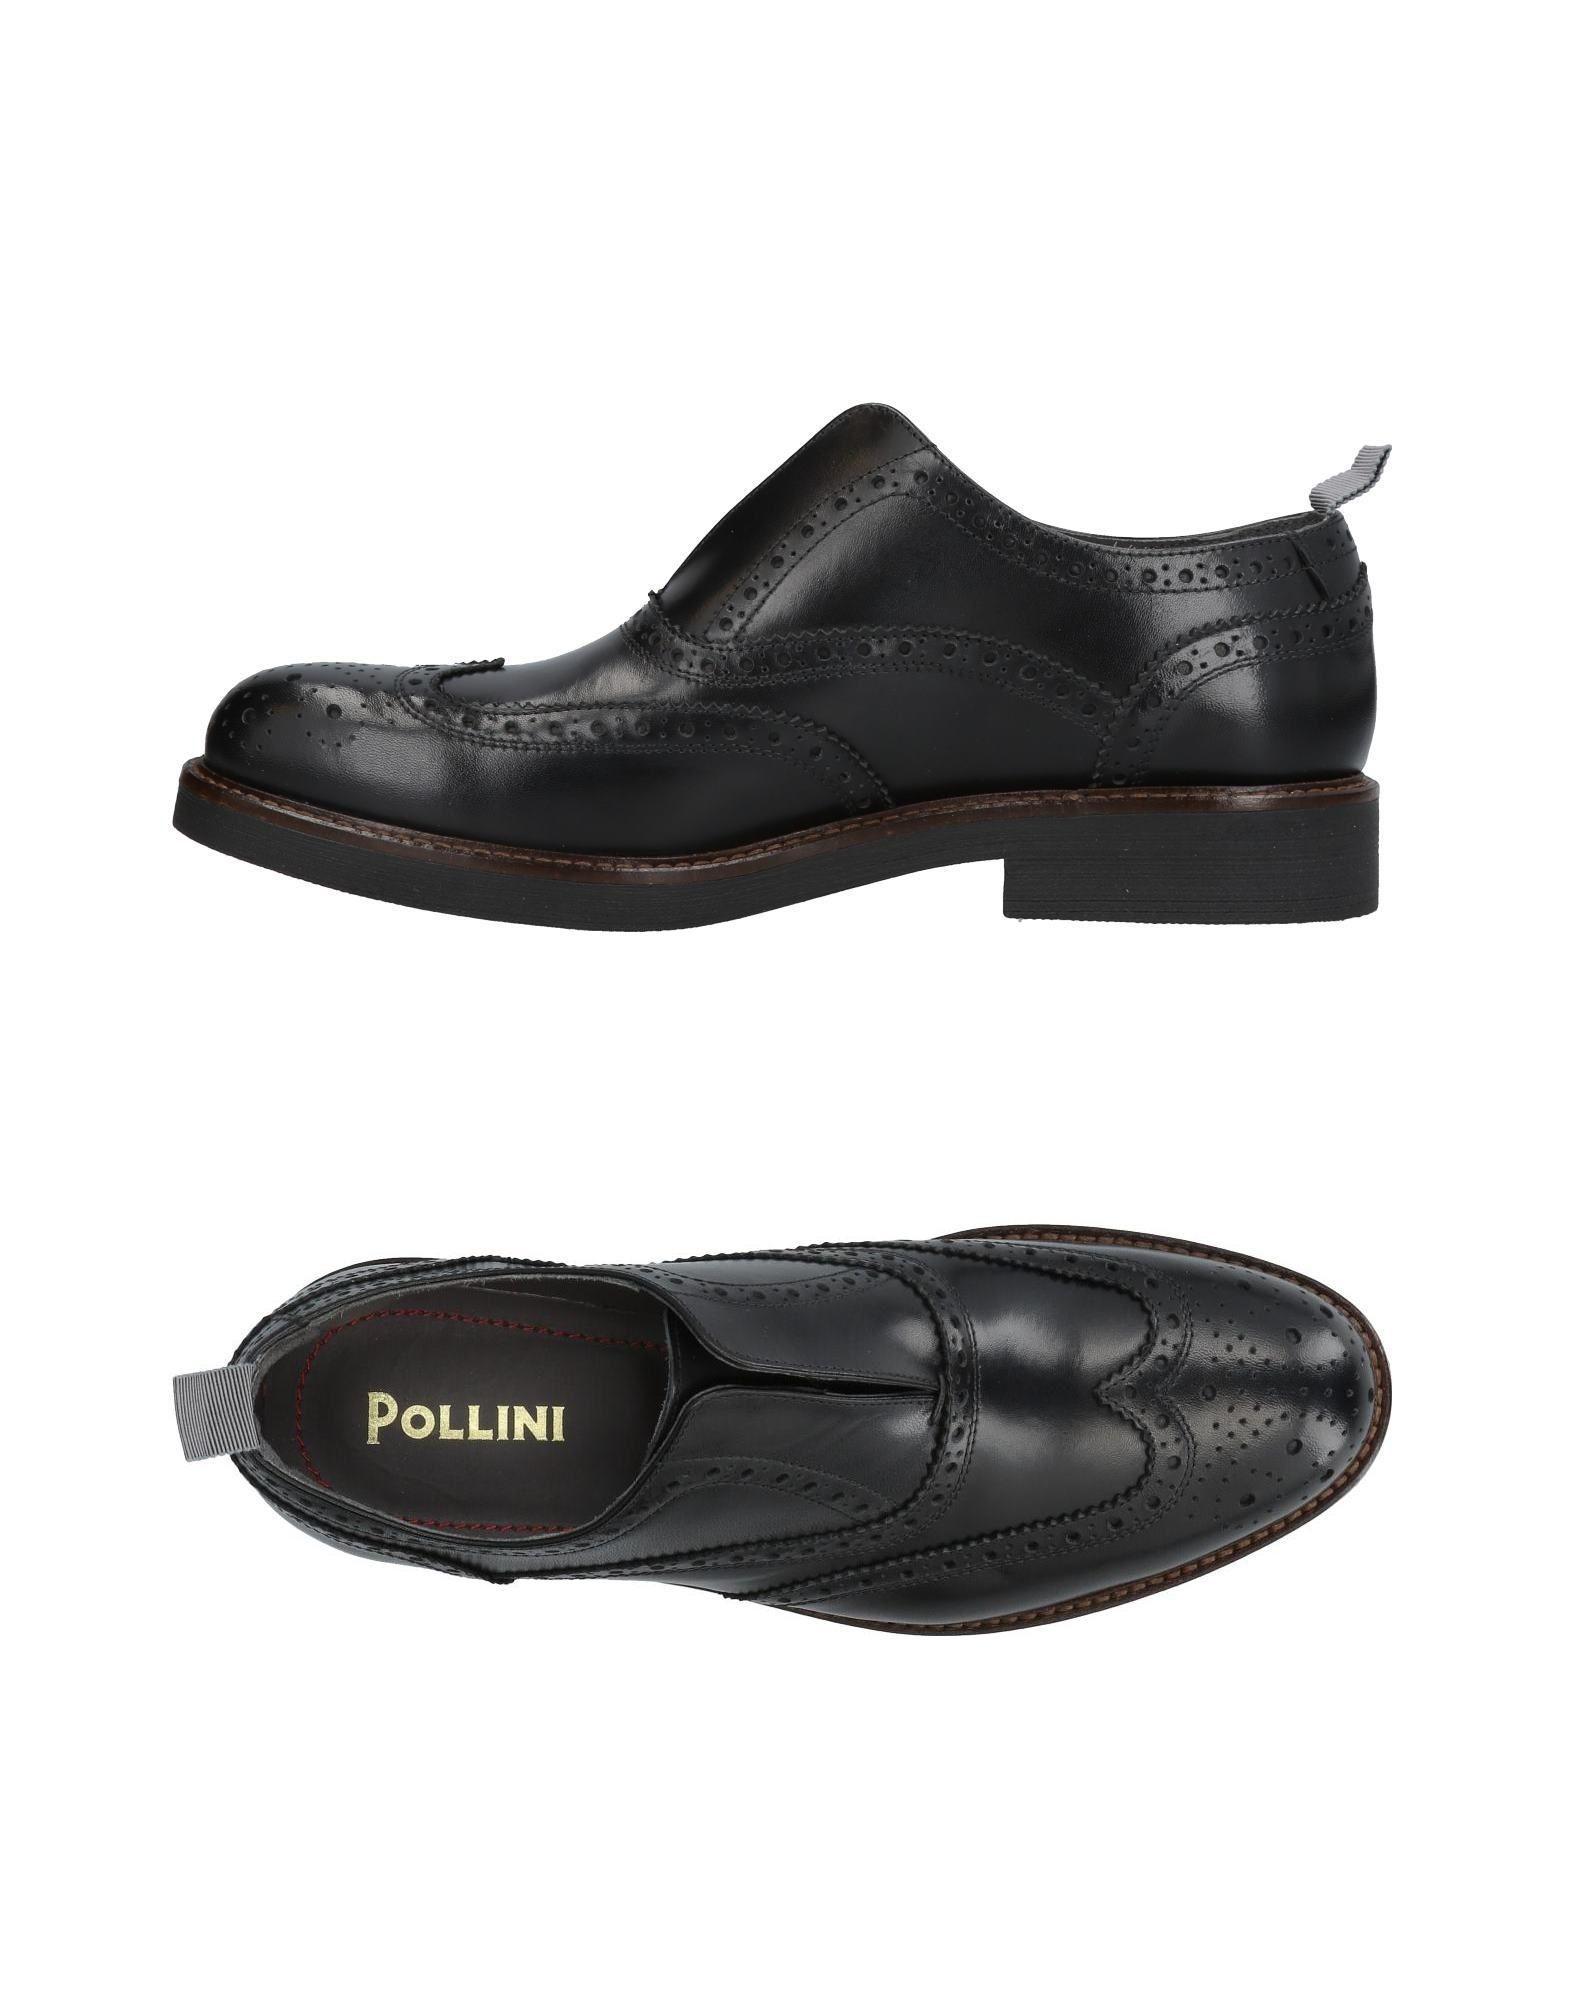 Pollini Loafers In Black